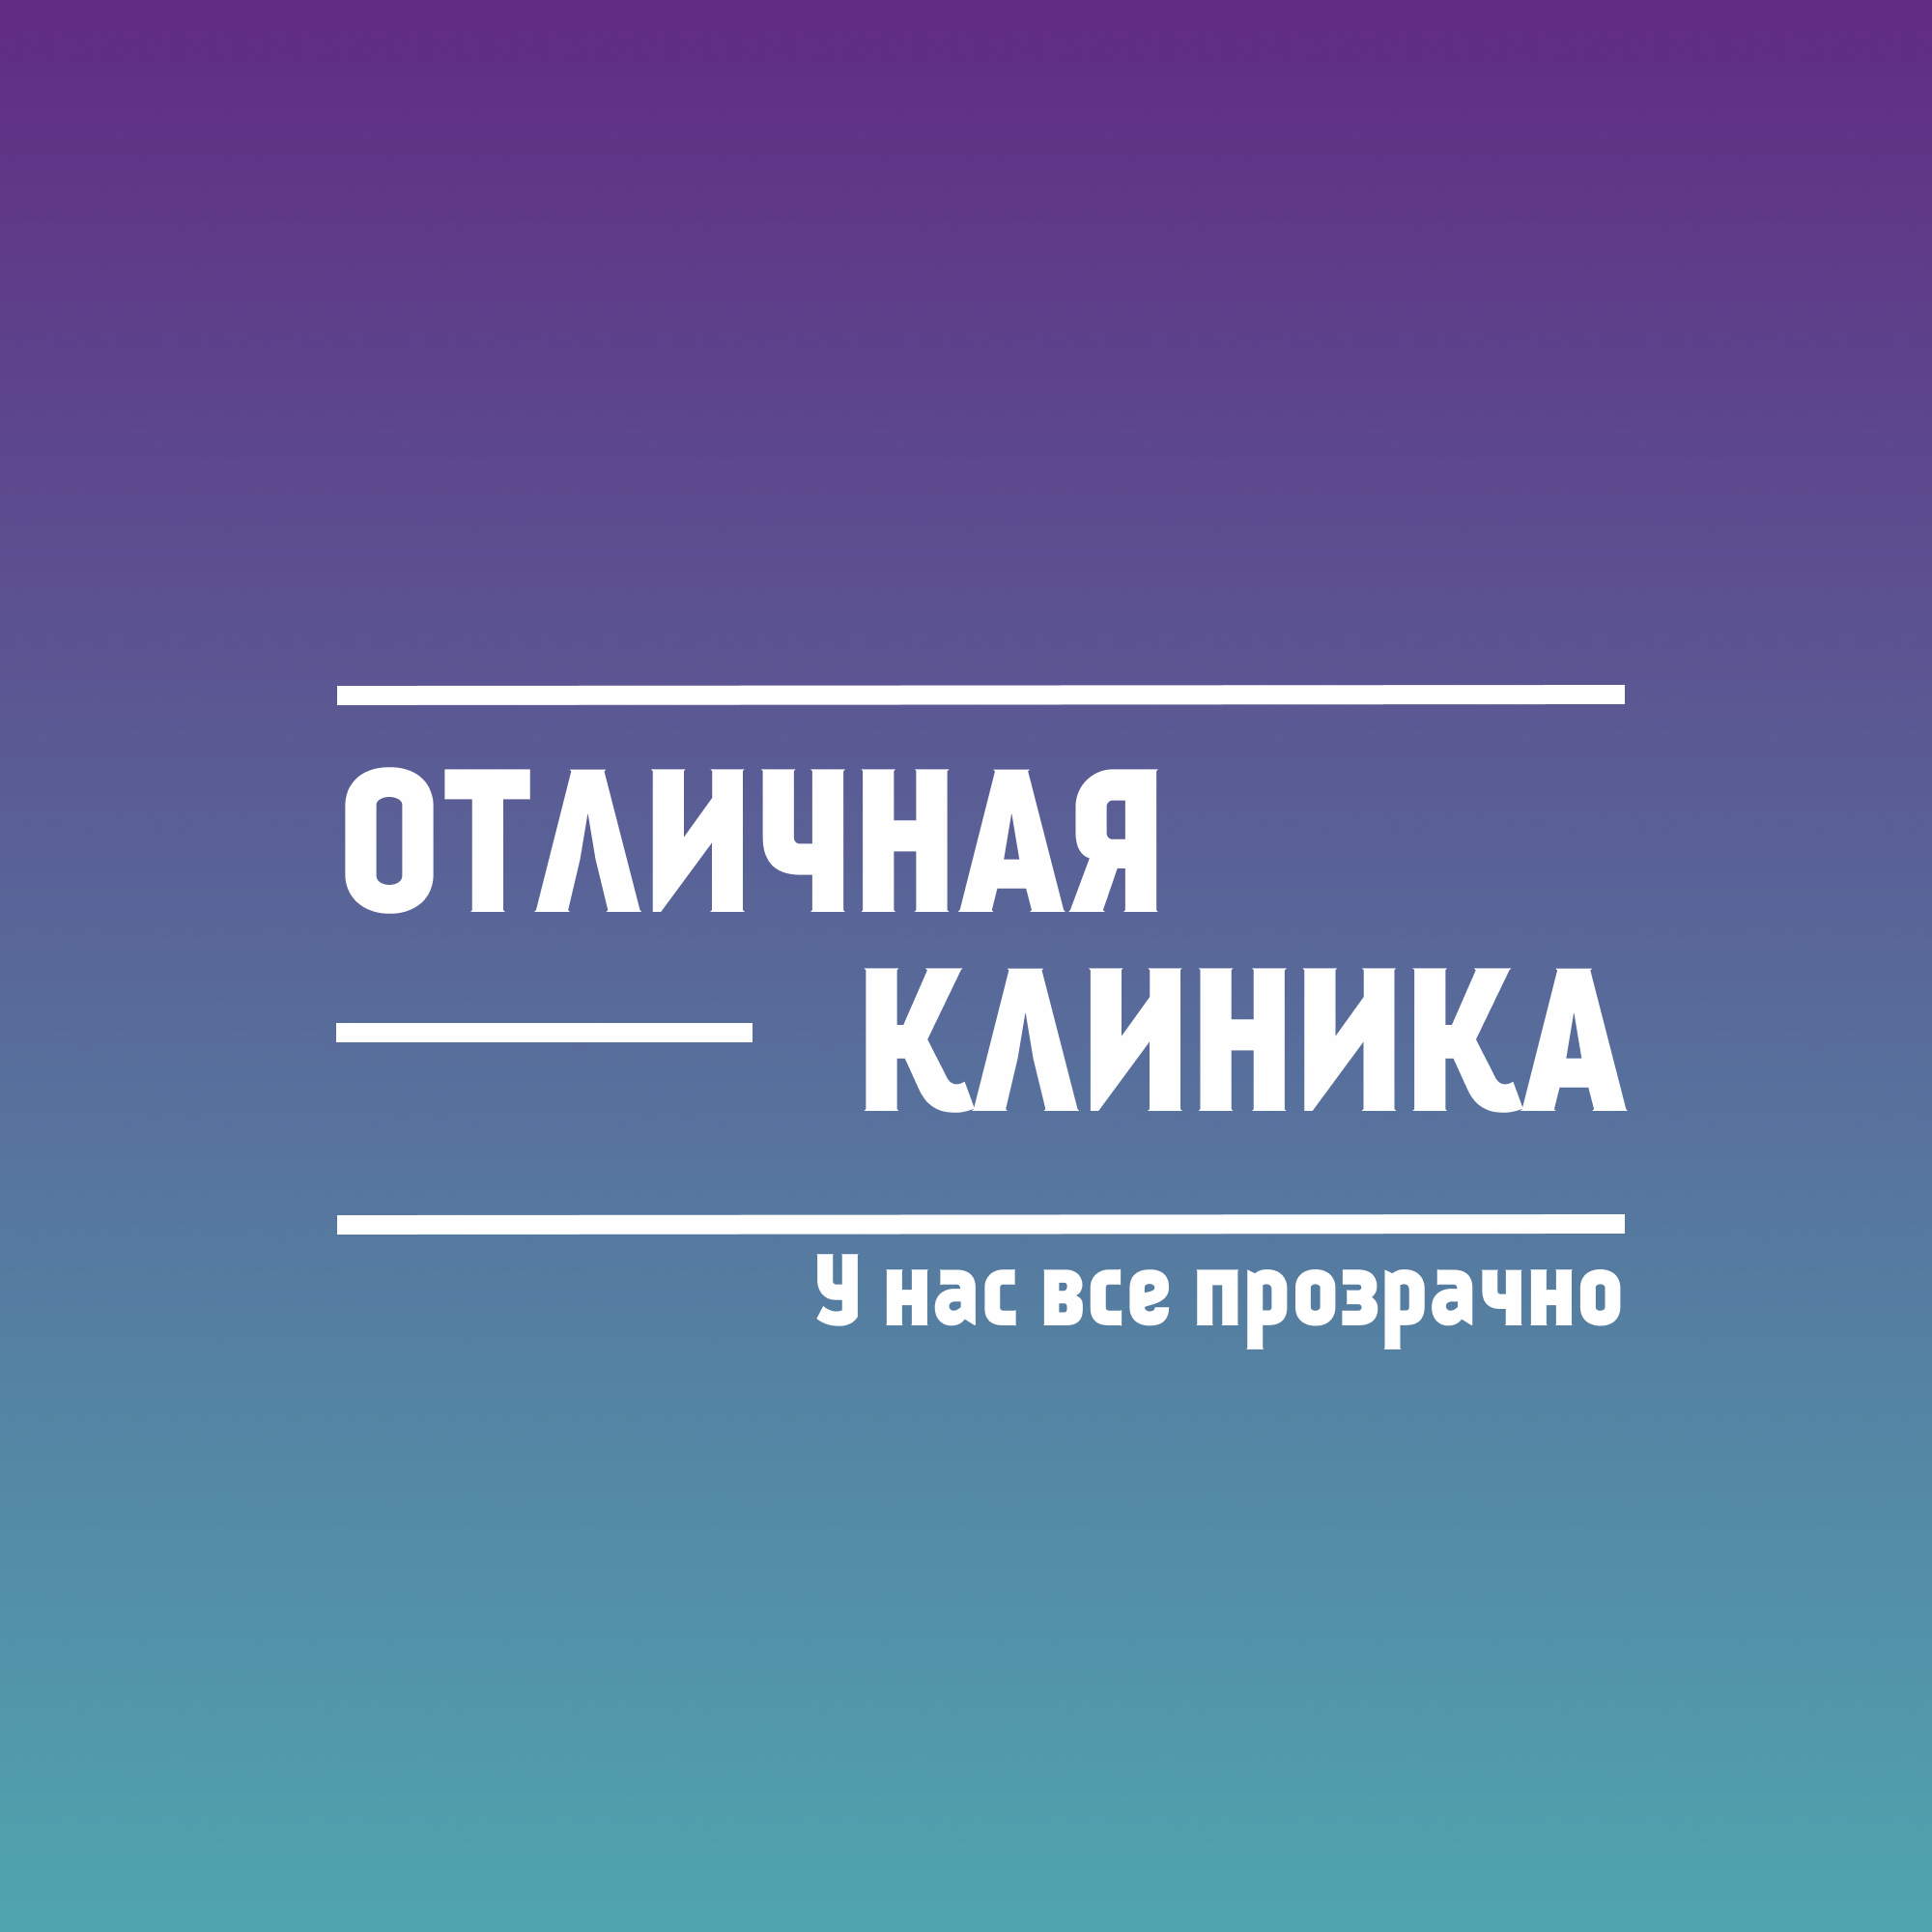 Логотип и фирменный стиль частной клиники фото f_3795c8fb35e180bc.png